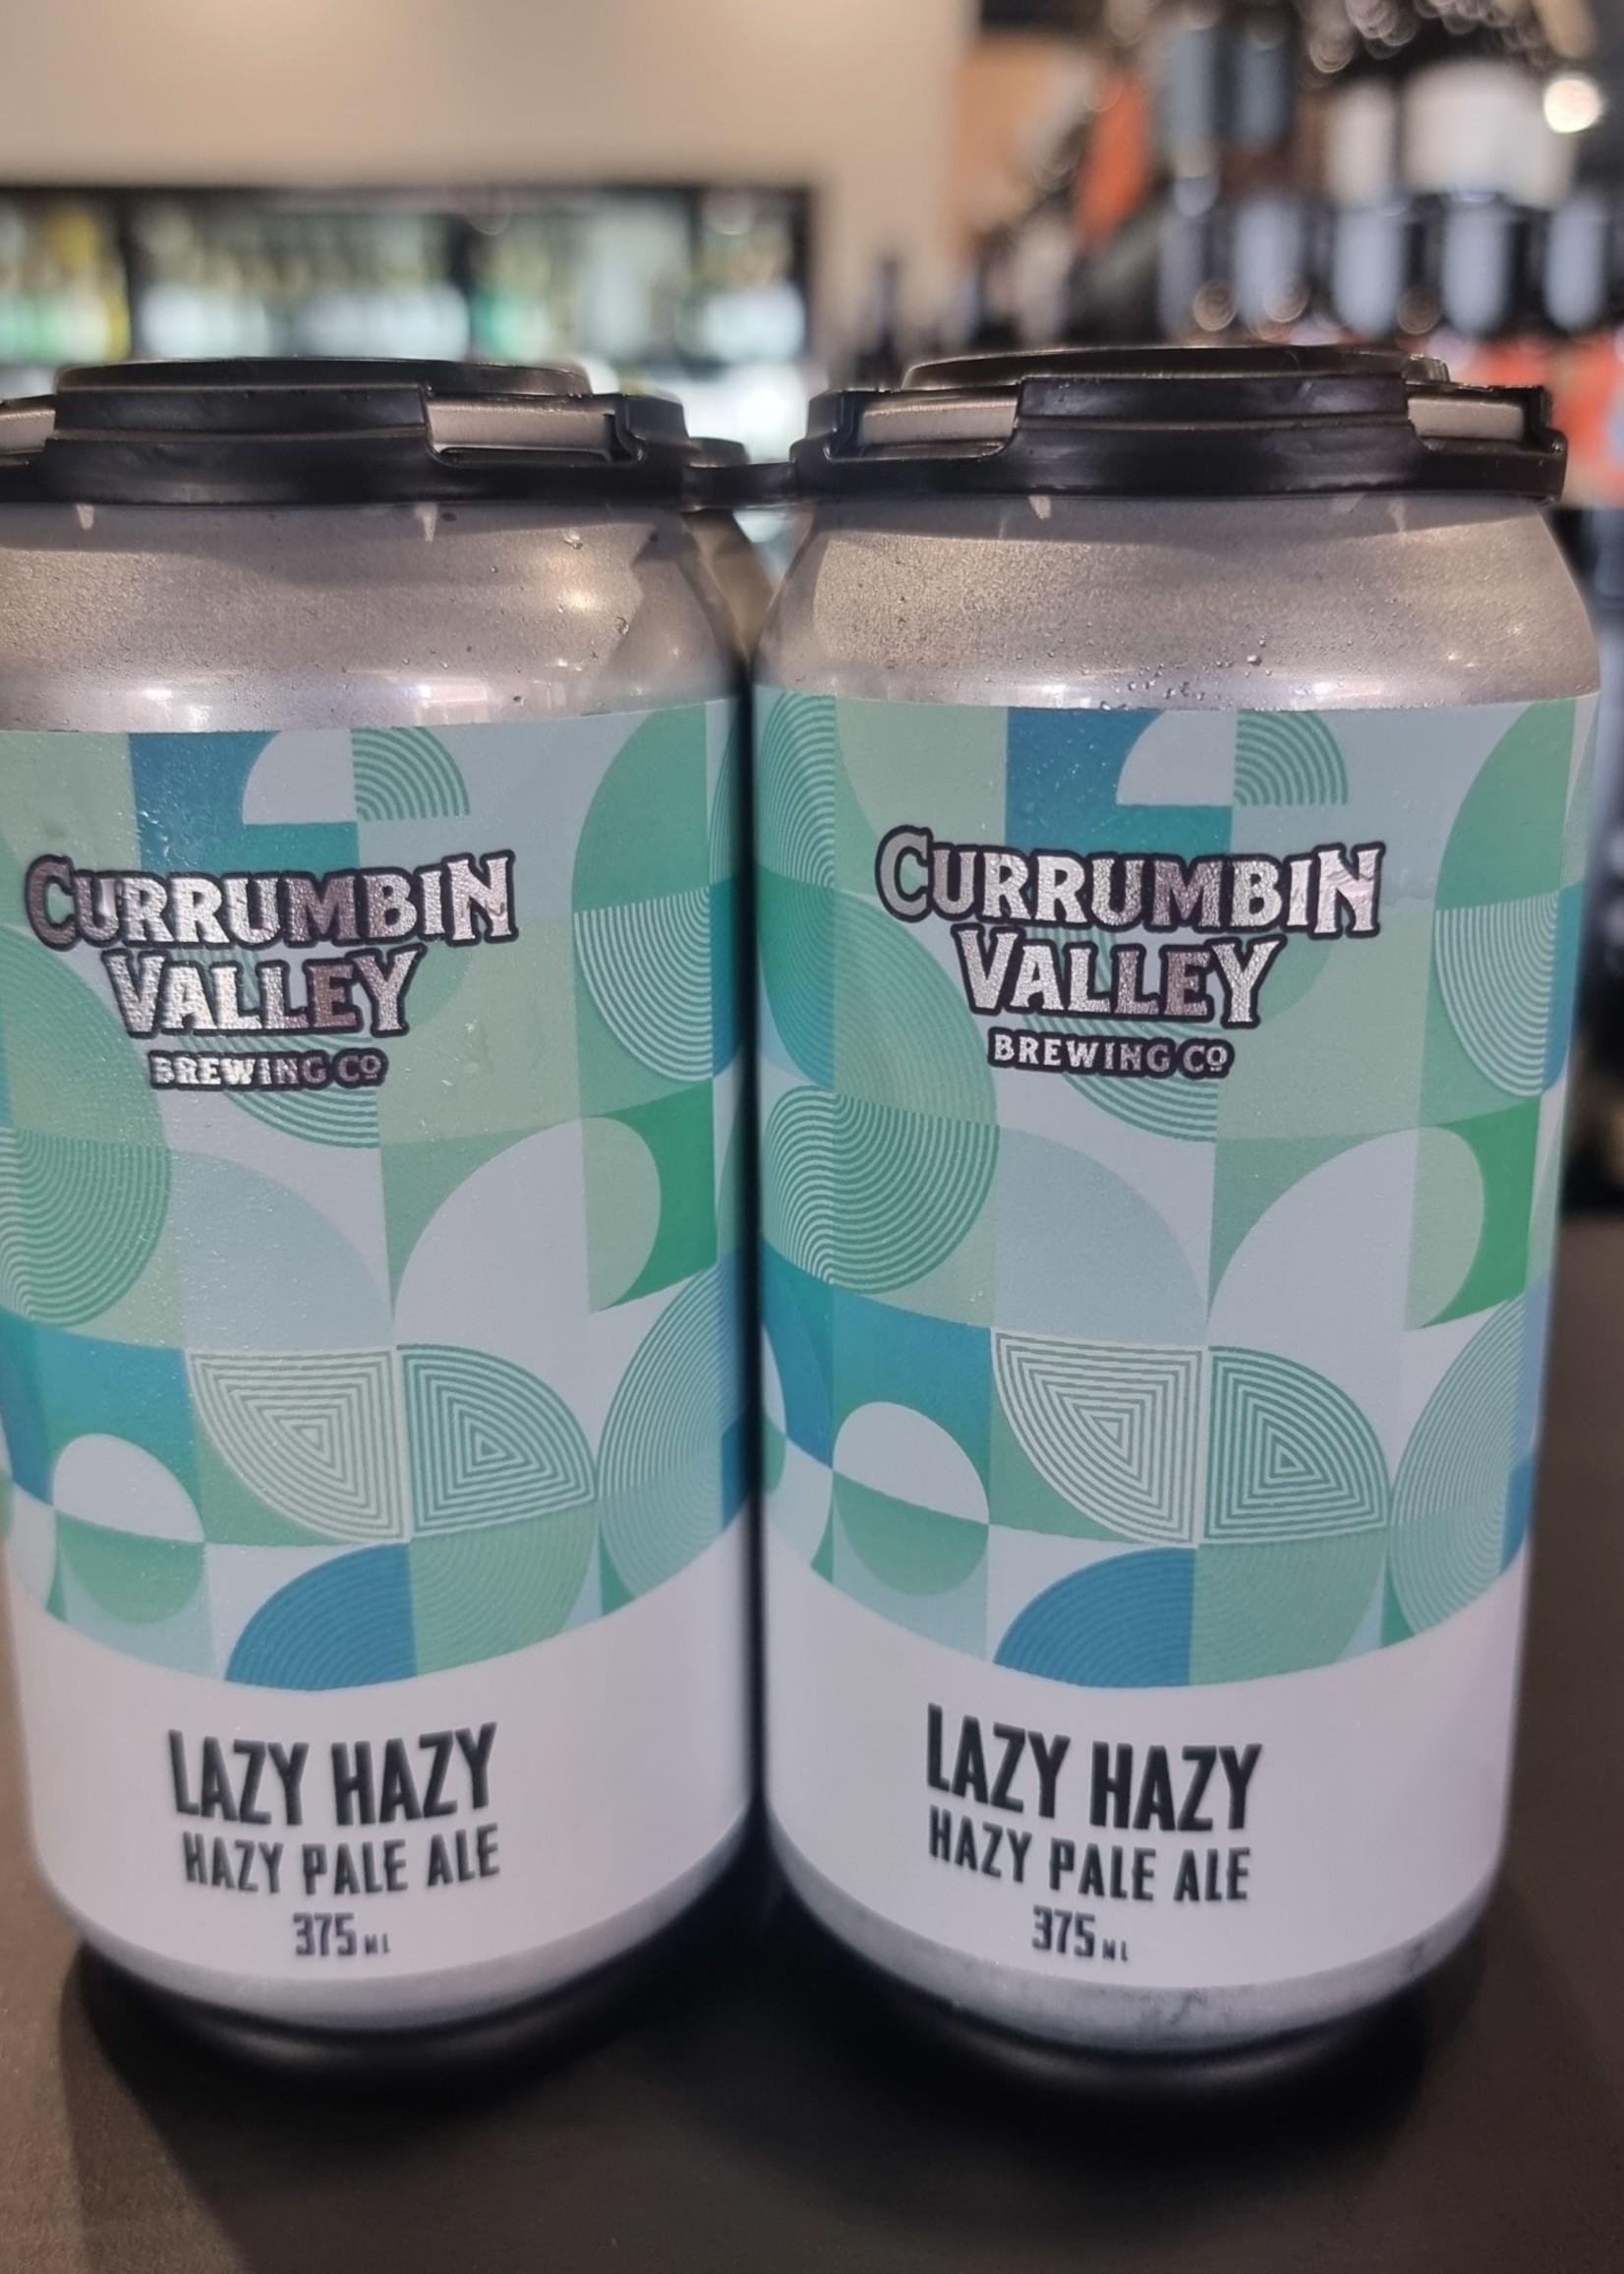 Currumbin Valley Currumbin Valley 'Lazy Hazy'  5.5% 4 Pack